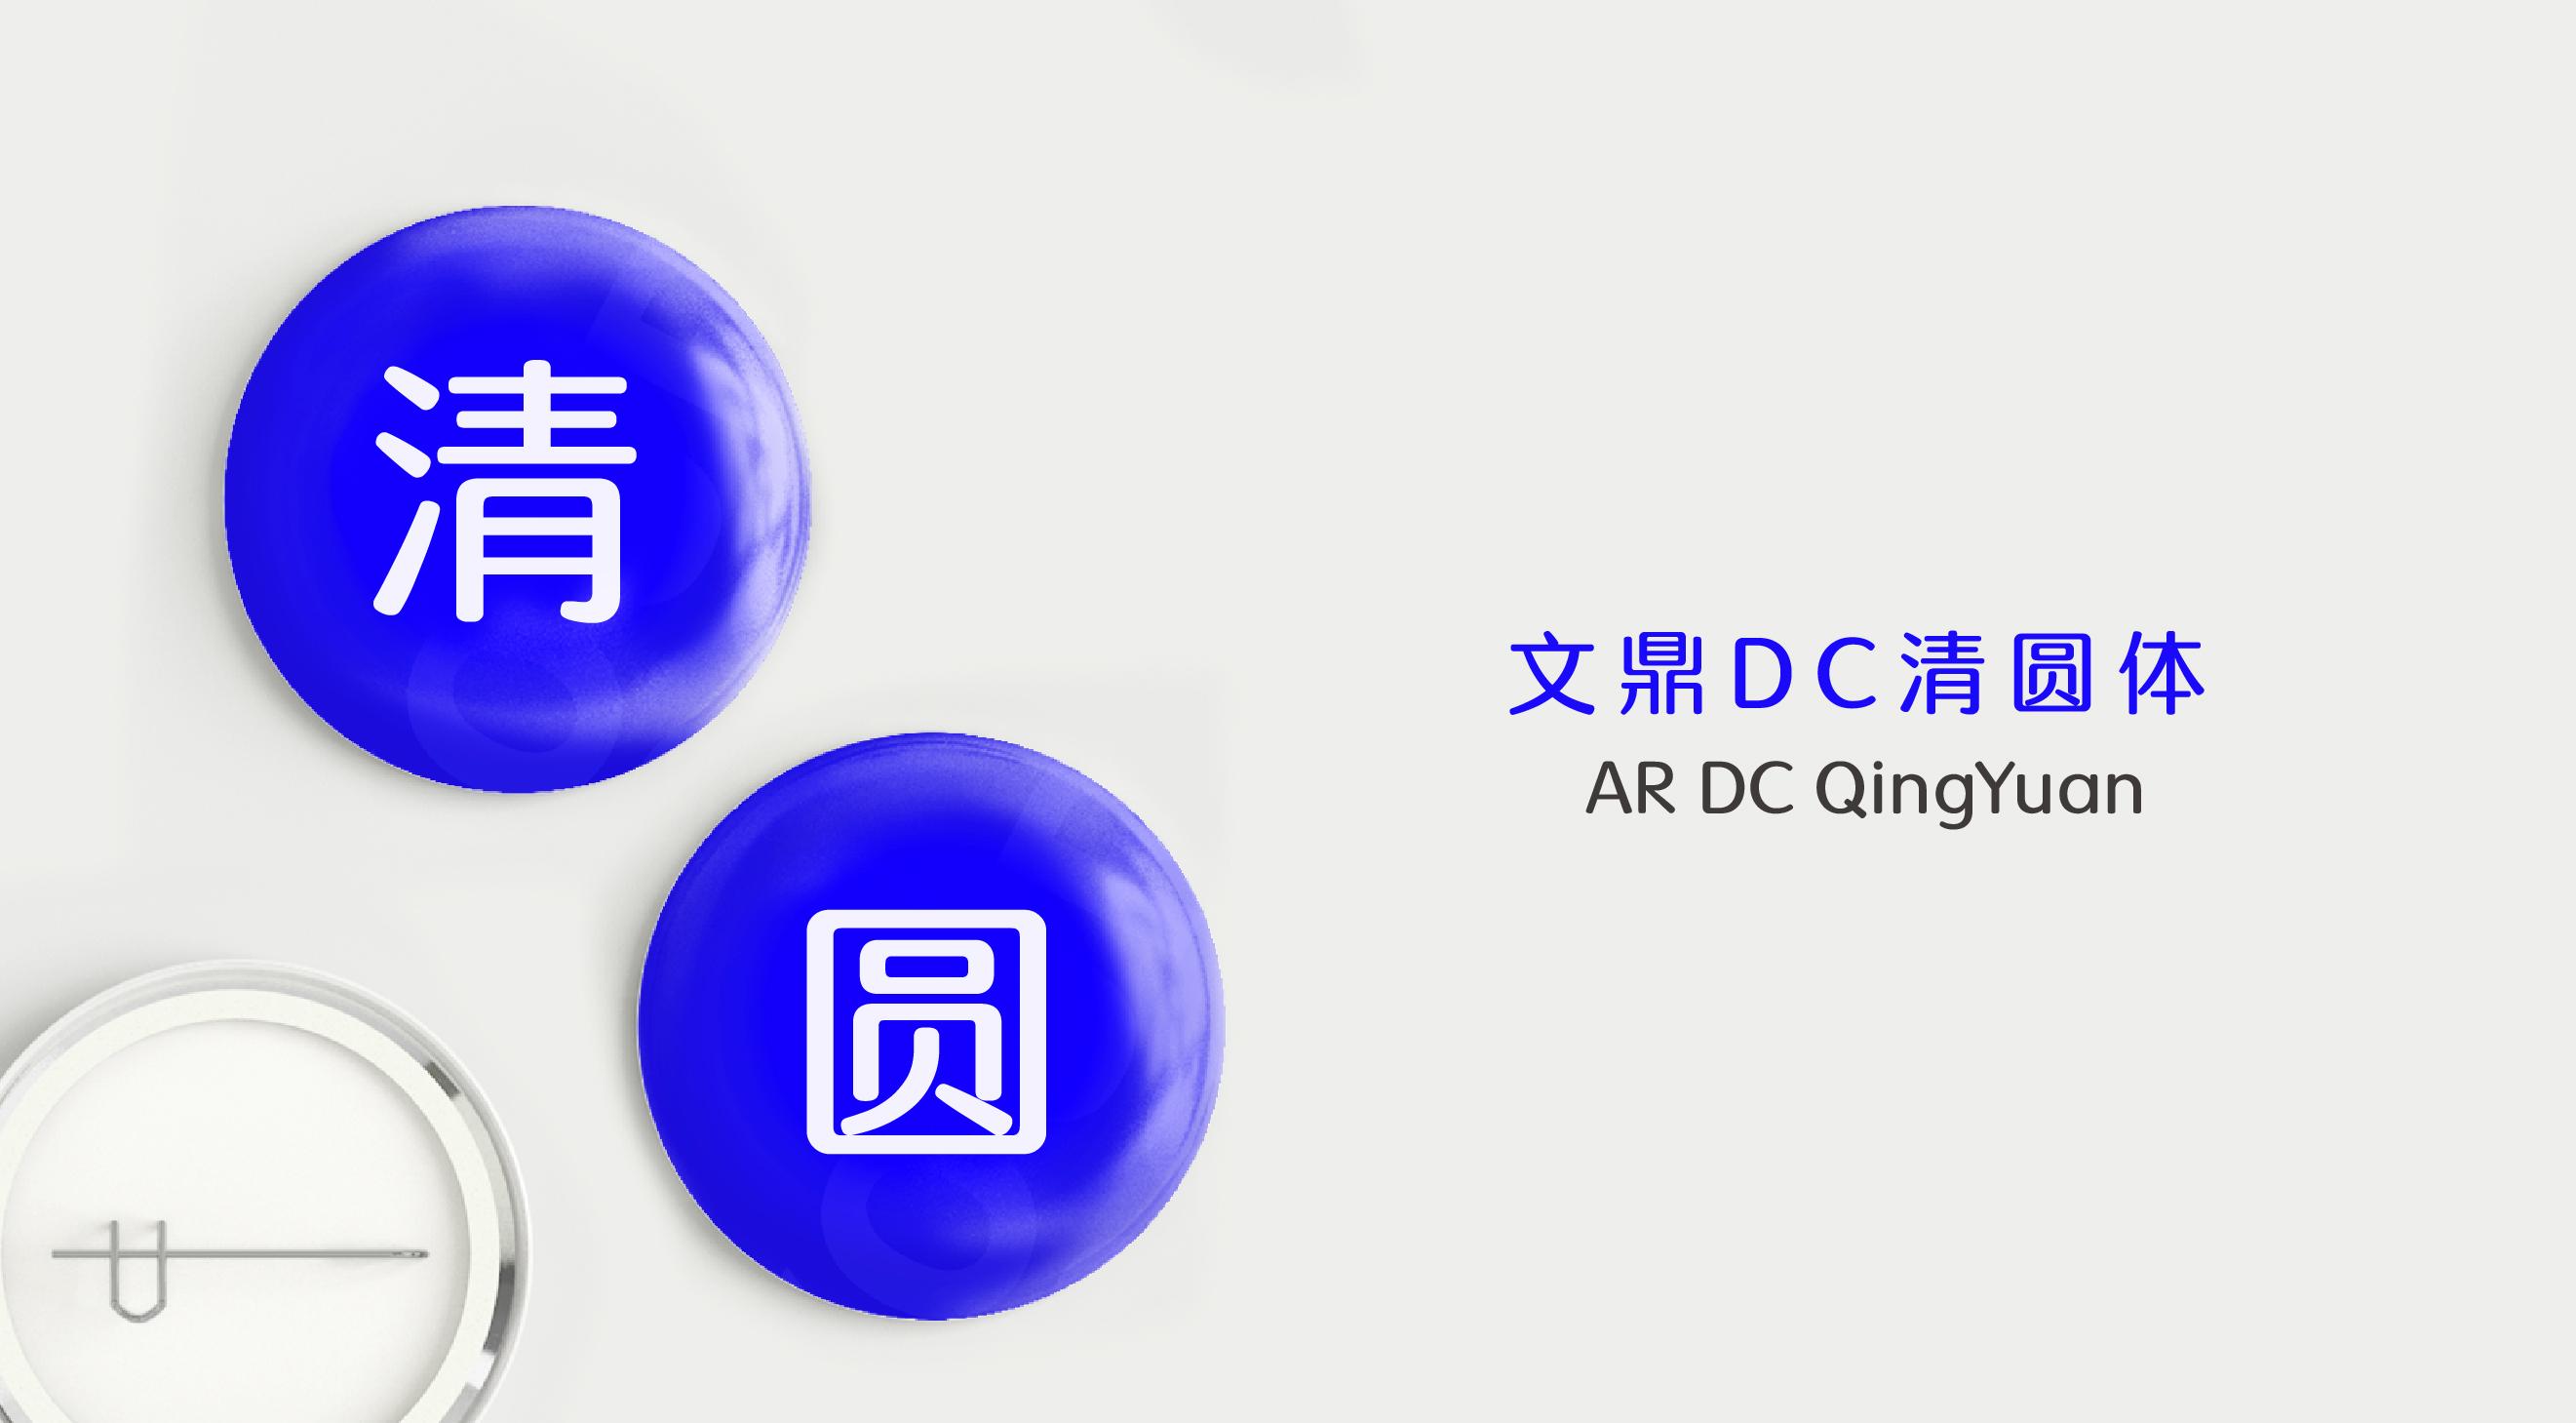 文鼎DC清圆体_BAR DCQingYuanGB BD